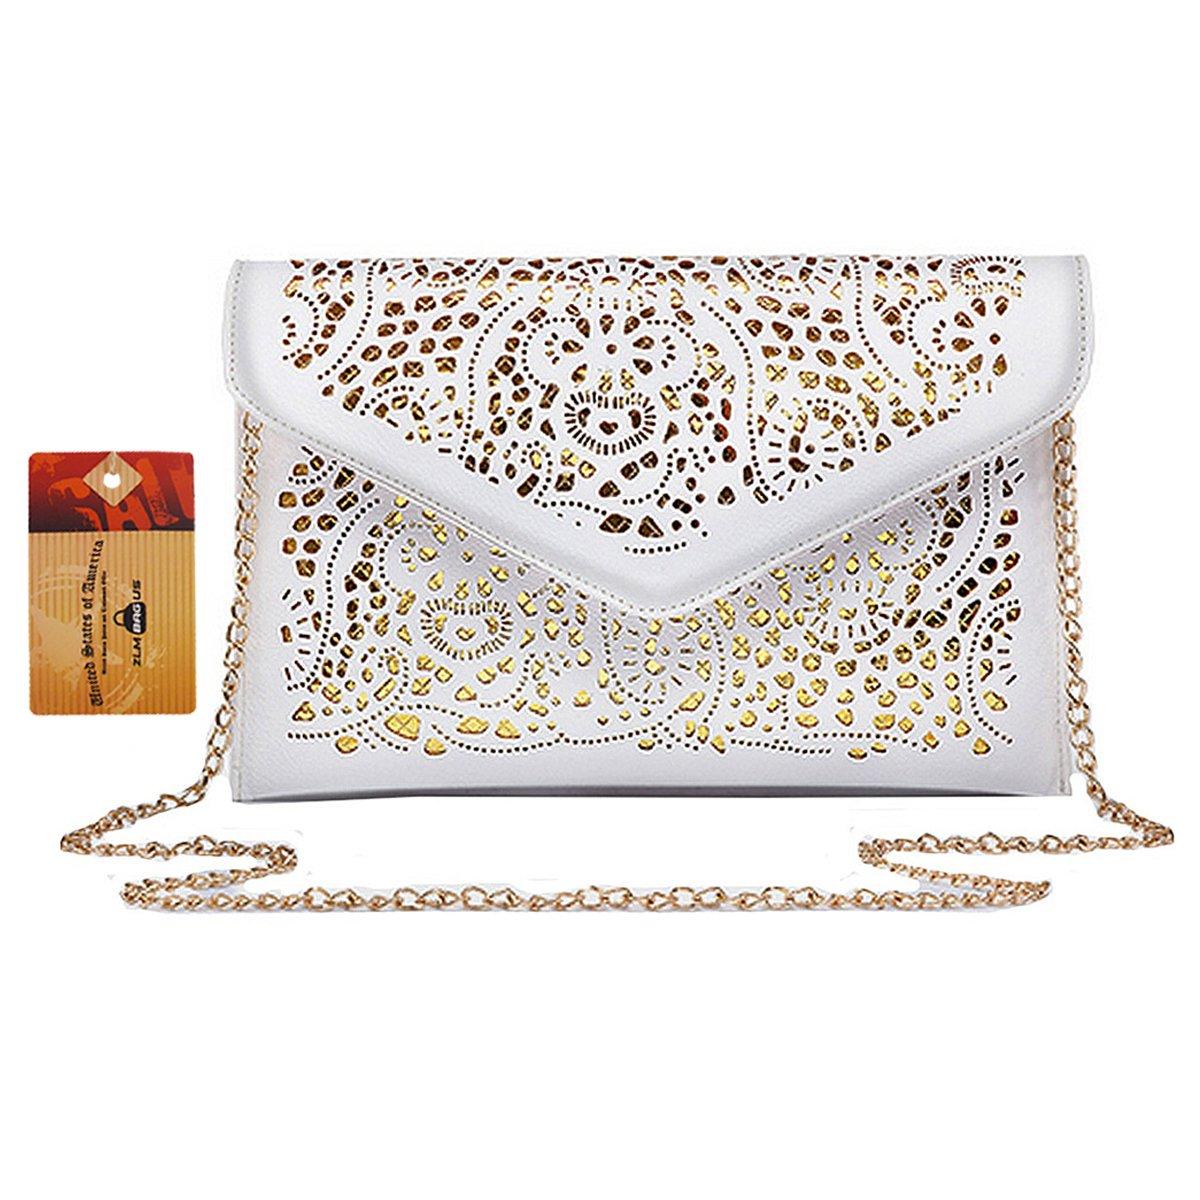 ZLM BAG US Women Hollow Out Floral Pattern Envelope Handbag Fashion PU Tote Evening Clutch Chain Crossbody Shoulder Bag White